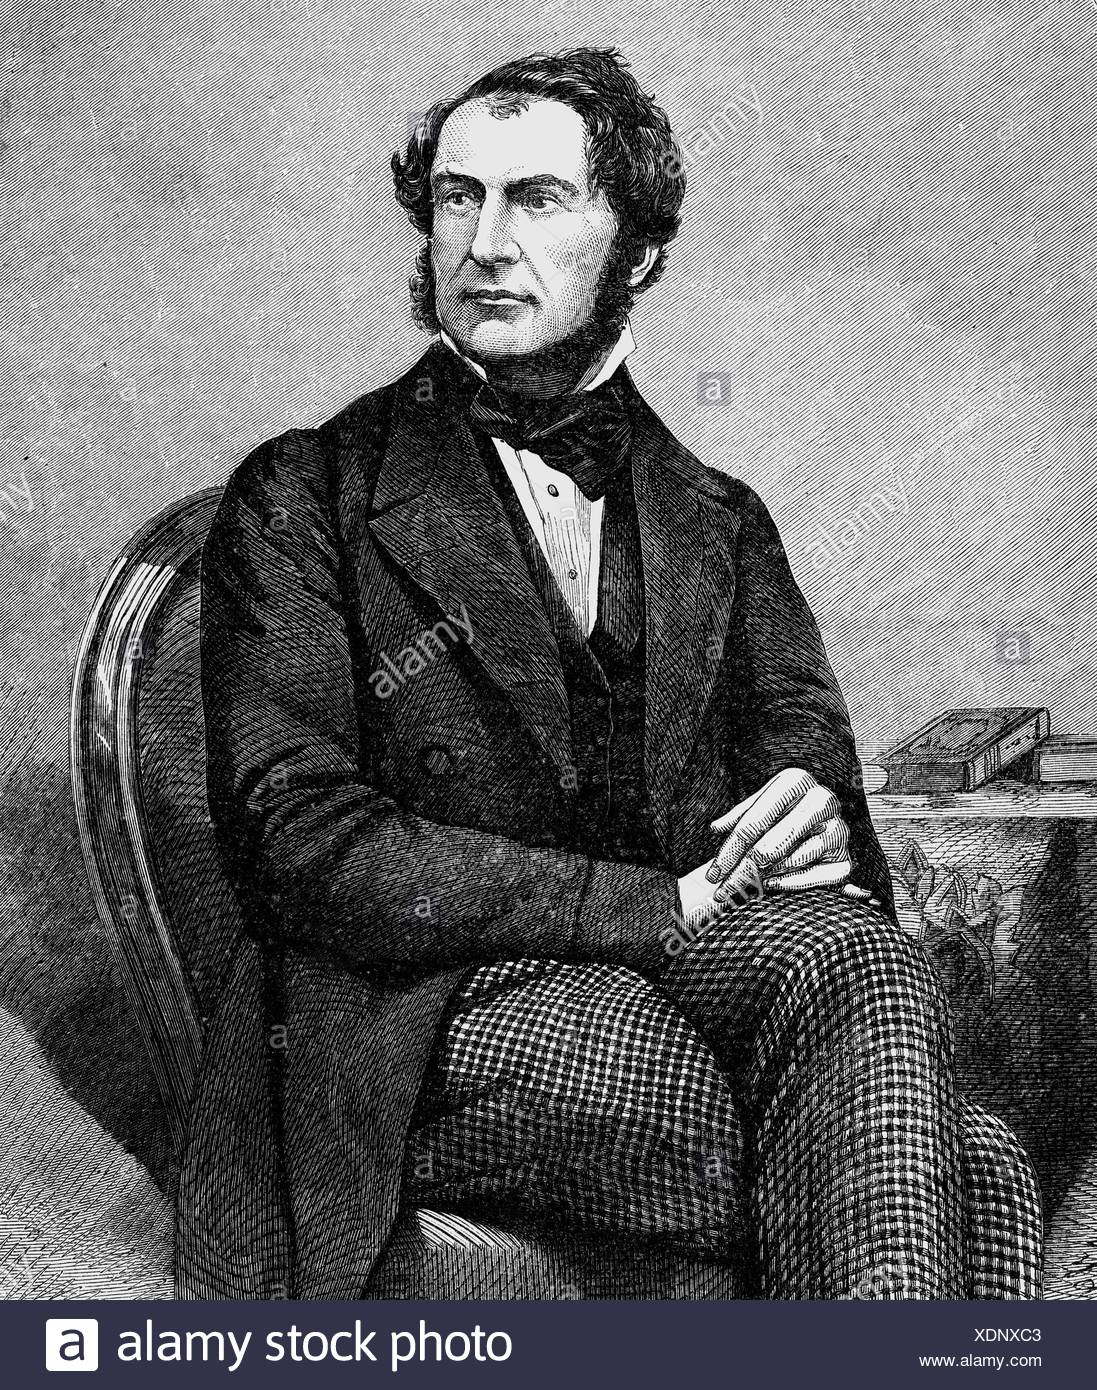 Gladstone, William Eward, 29.12.1809 - 19.5.1898, British politician (Lib.), Chancellor of the Exchequer 18.6.1859 - , Additional-Rights-Clearances-NA - Stock Image